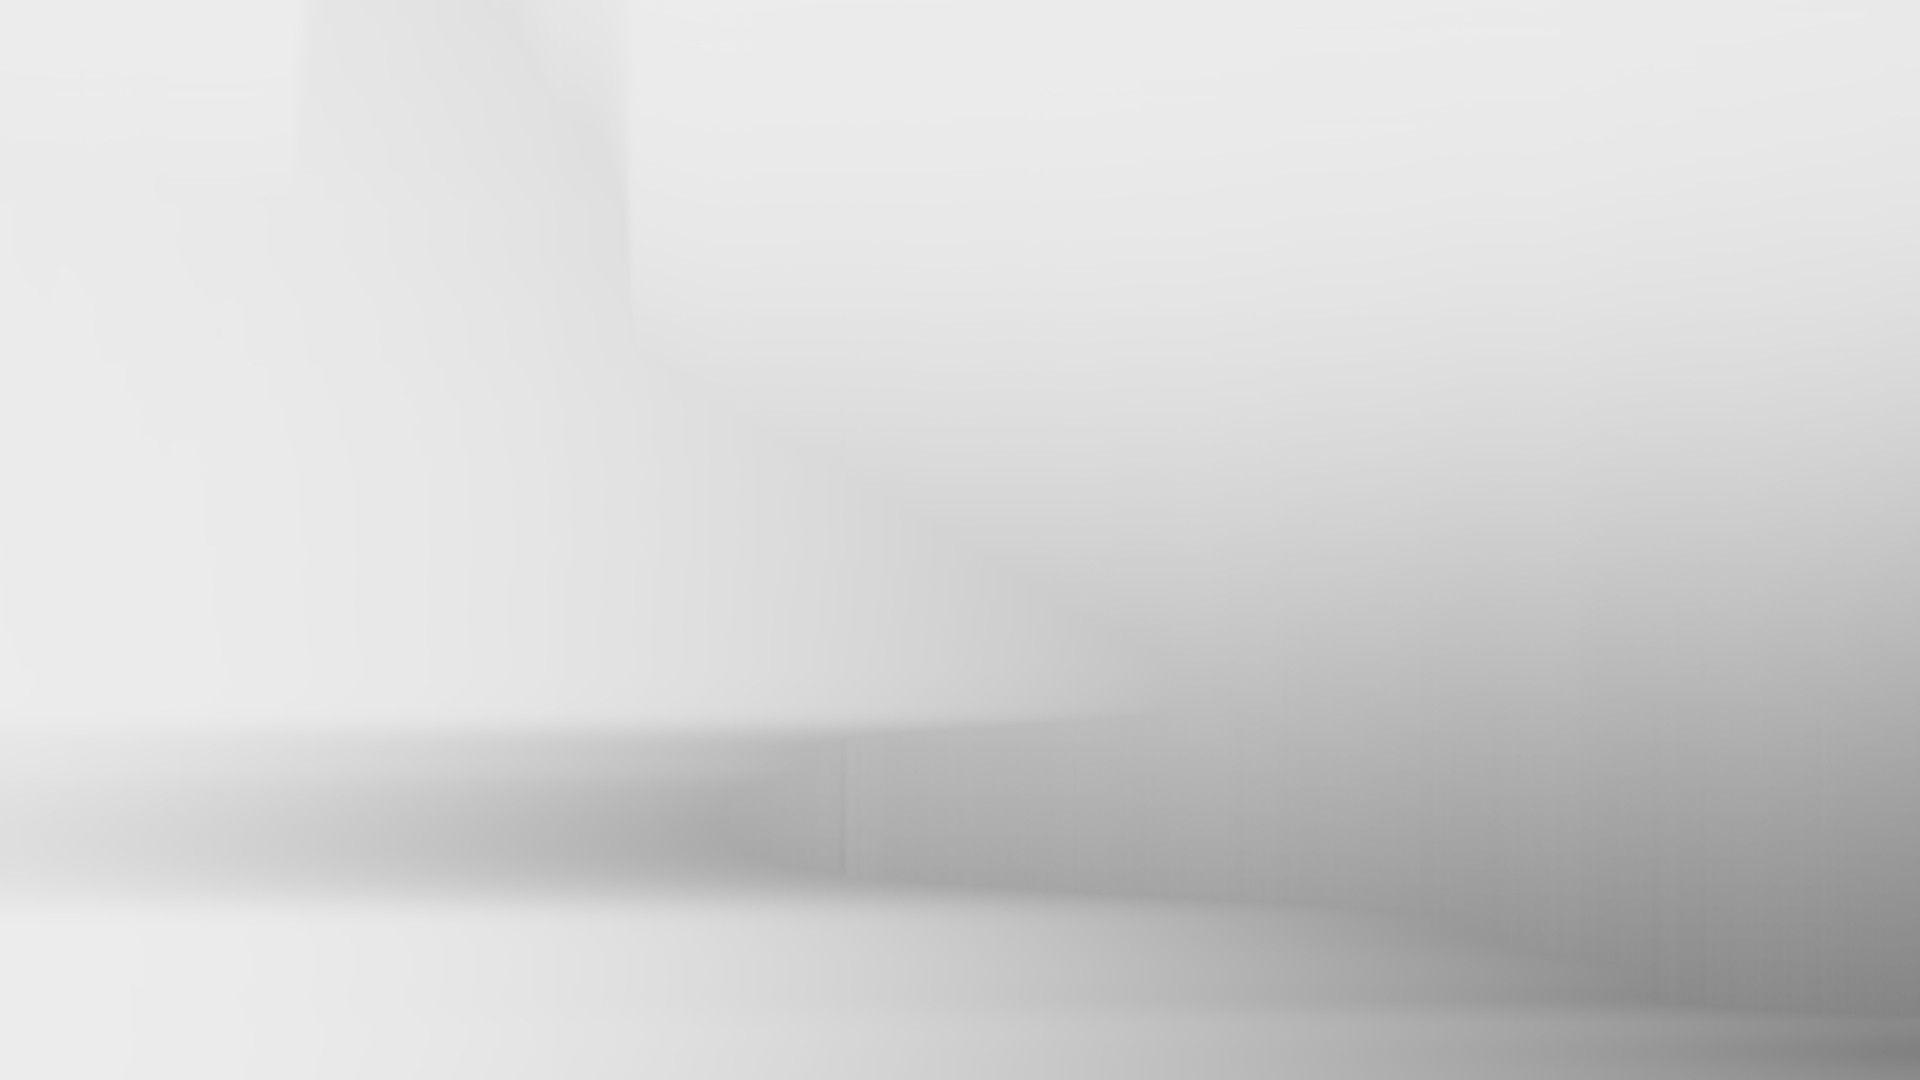 white backgrounds wallpapers wallpaper cave. Black Bedroom Furniture Sets. Home Design Ideas